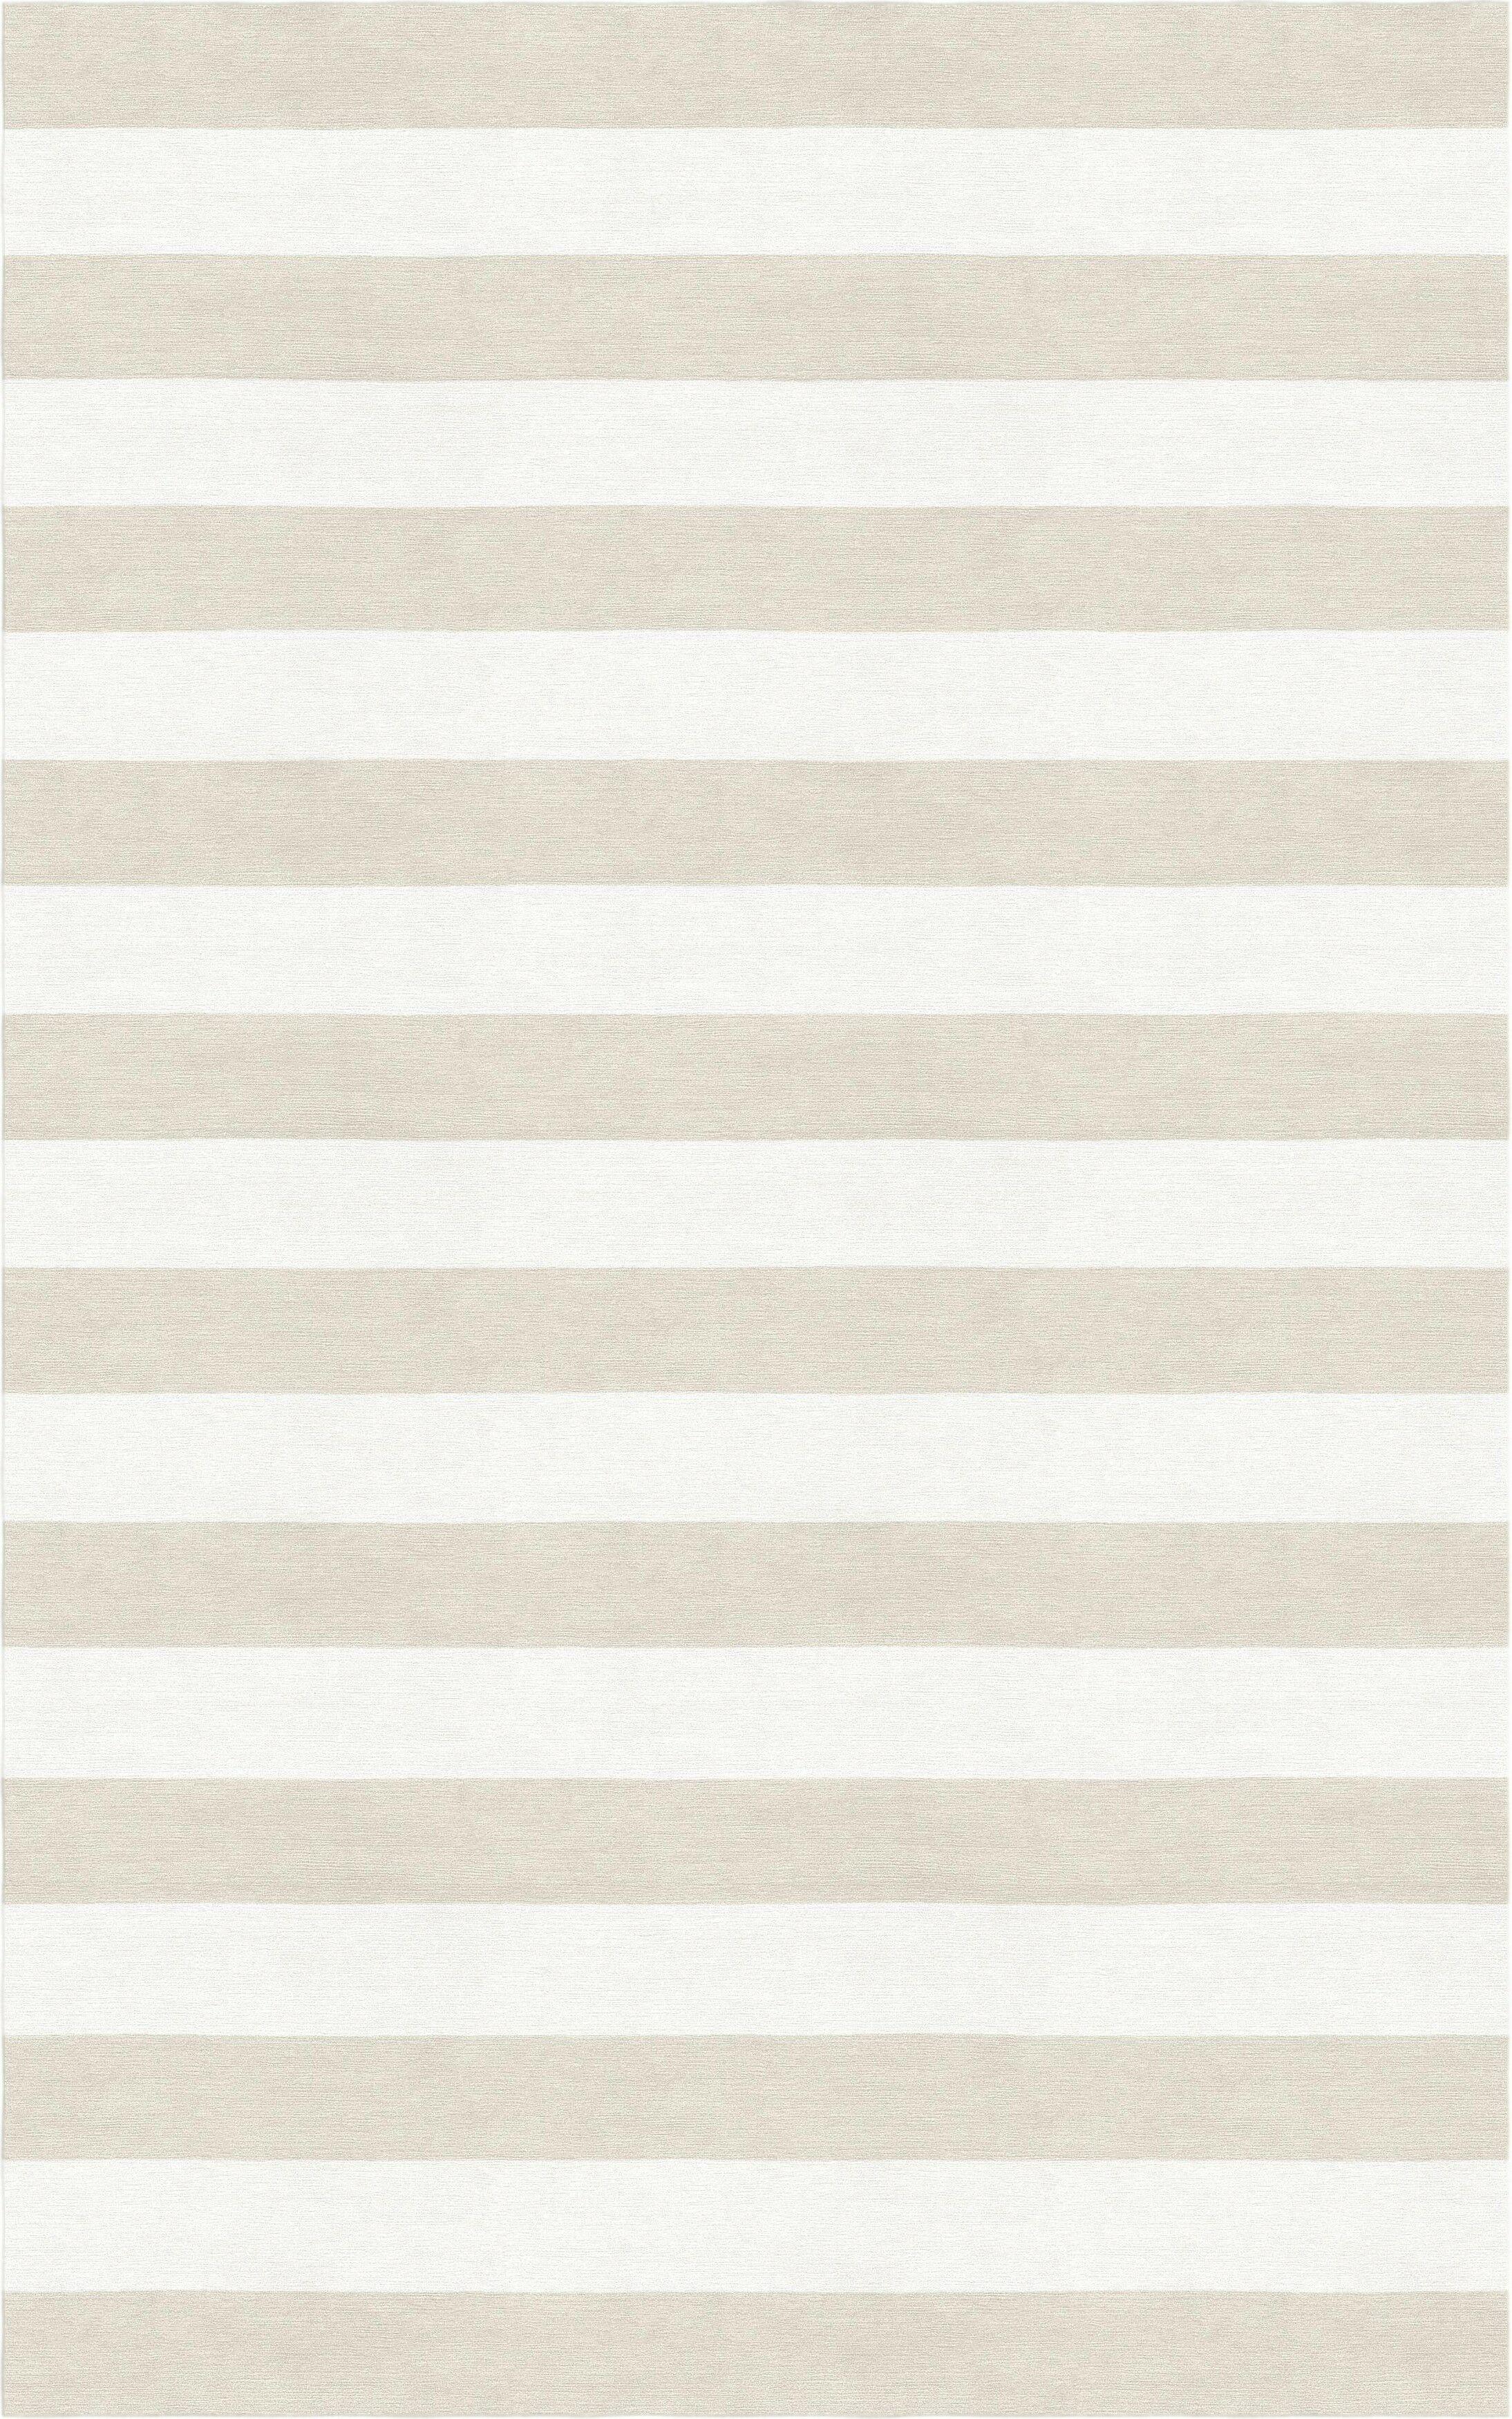 Bathory Stripe Hand-Tufted Wool Beige/White Area Rug Rug Size: Rectangle 8' x 10'